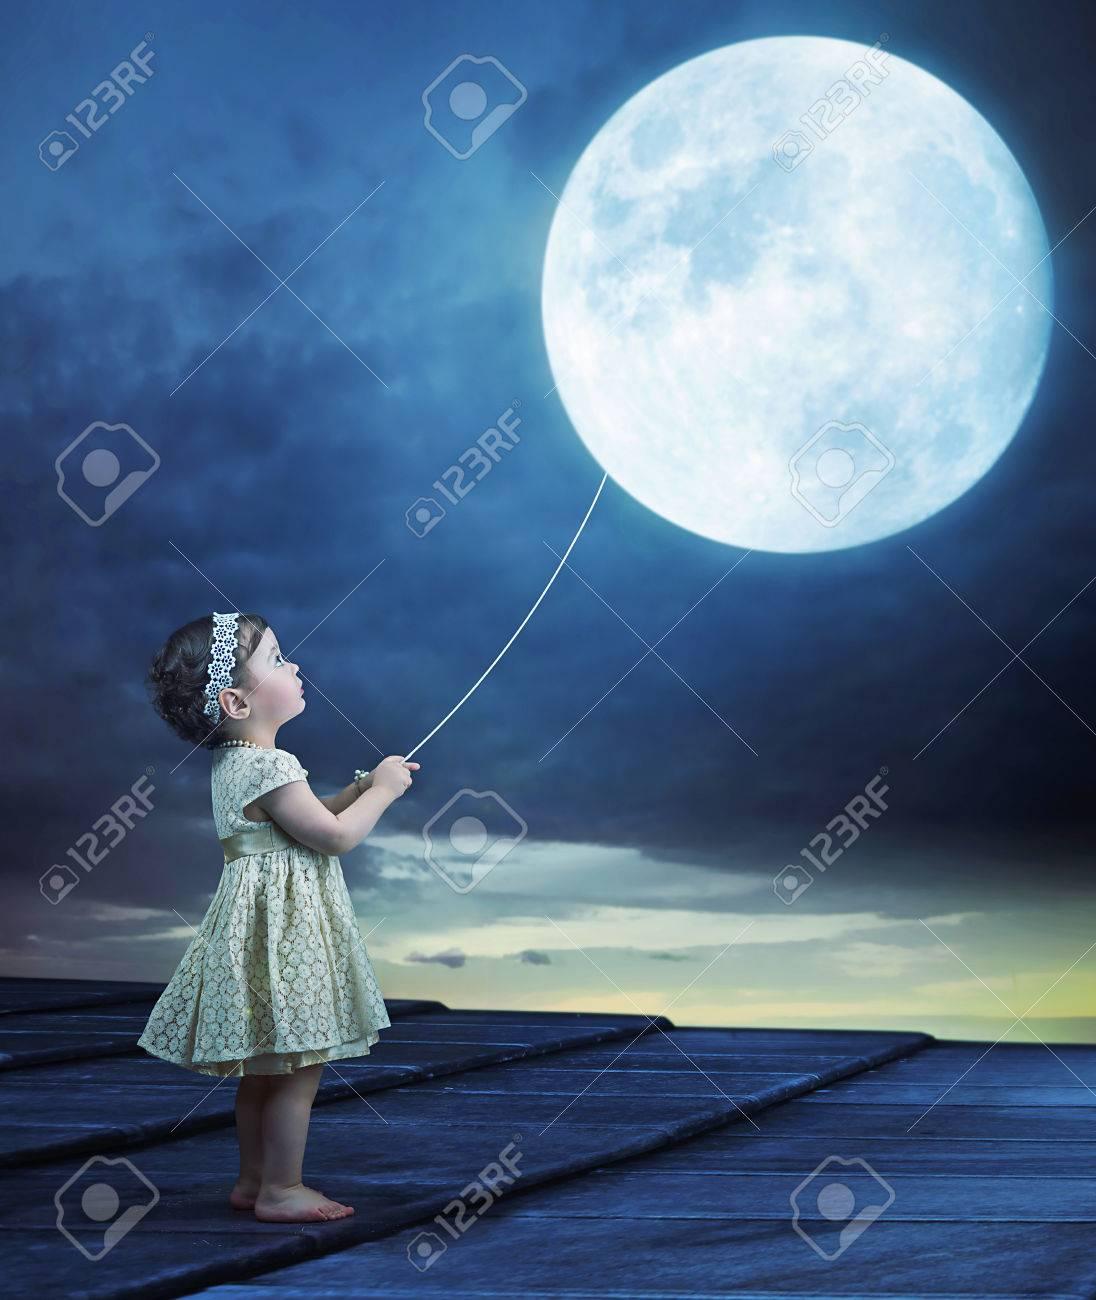 conceptual image of a cute baby holding a moon balloon stock photo